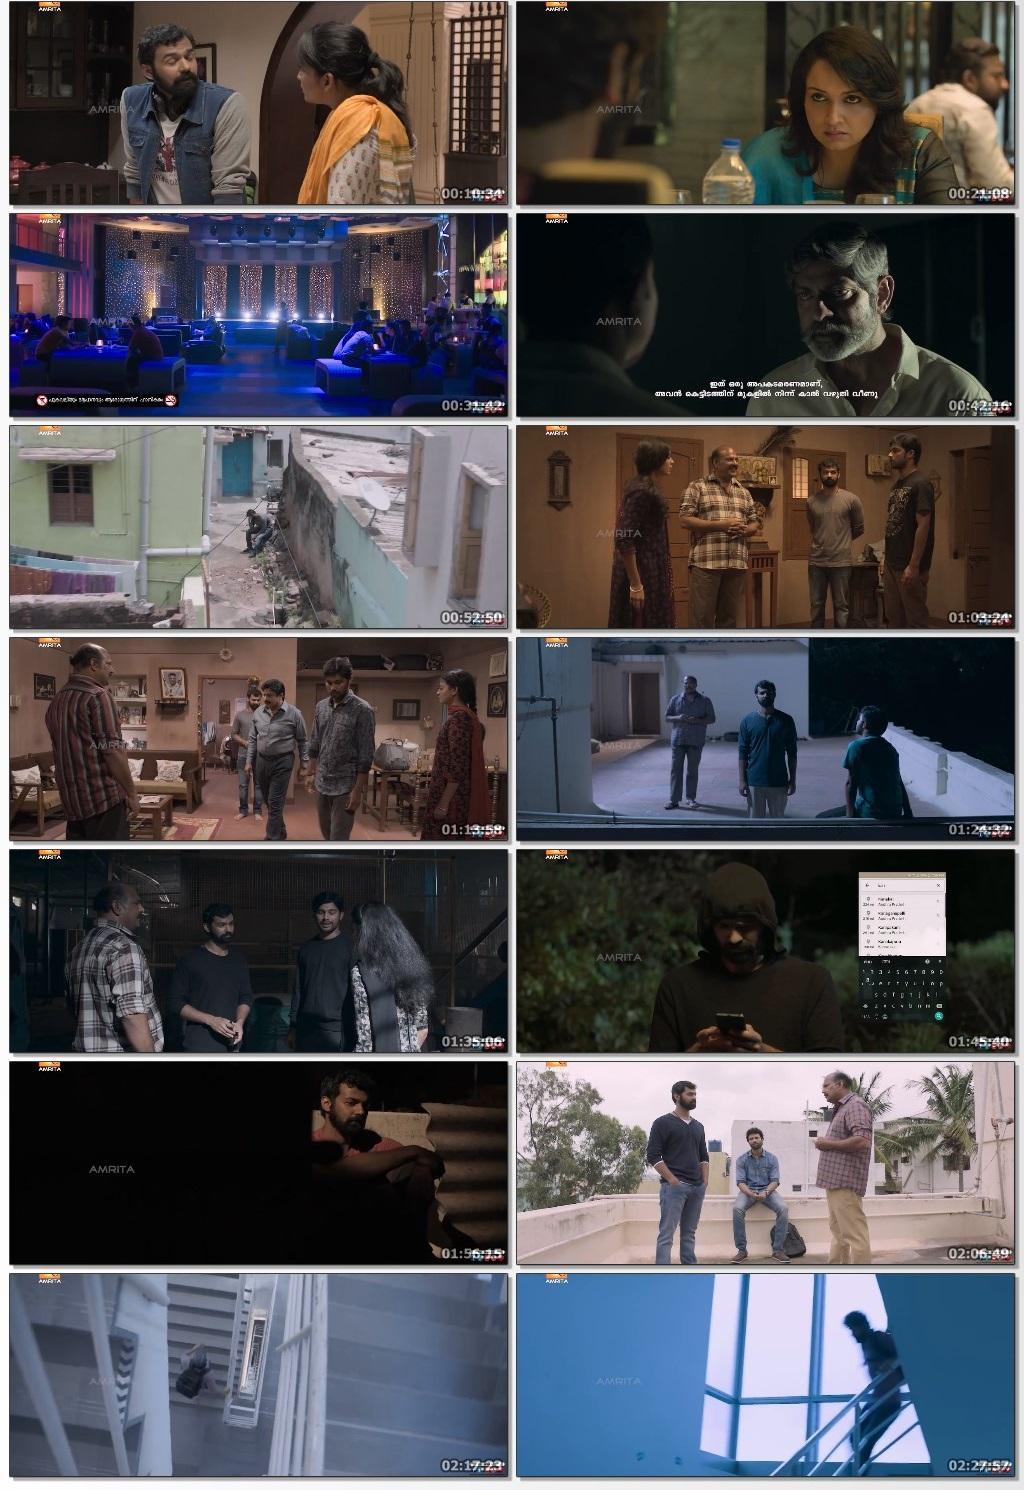 Aadhi-2018-www-9kmovies-cards-Hindi-ORG-Dual-Audio-UNCUT-720p-HDRip-1-4-GB-mkv-thumbs96eac80073c57ef